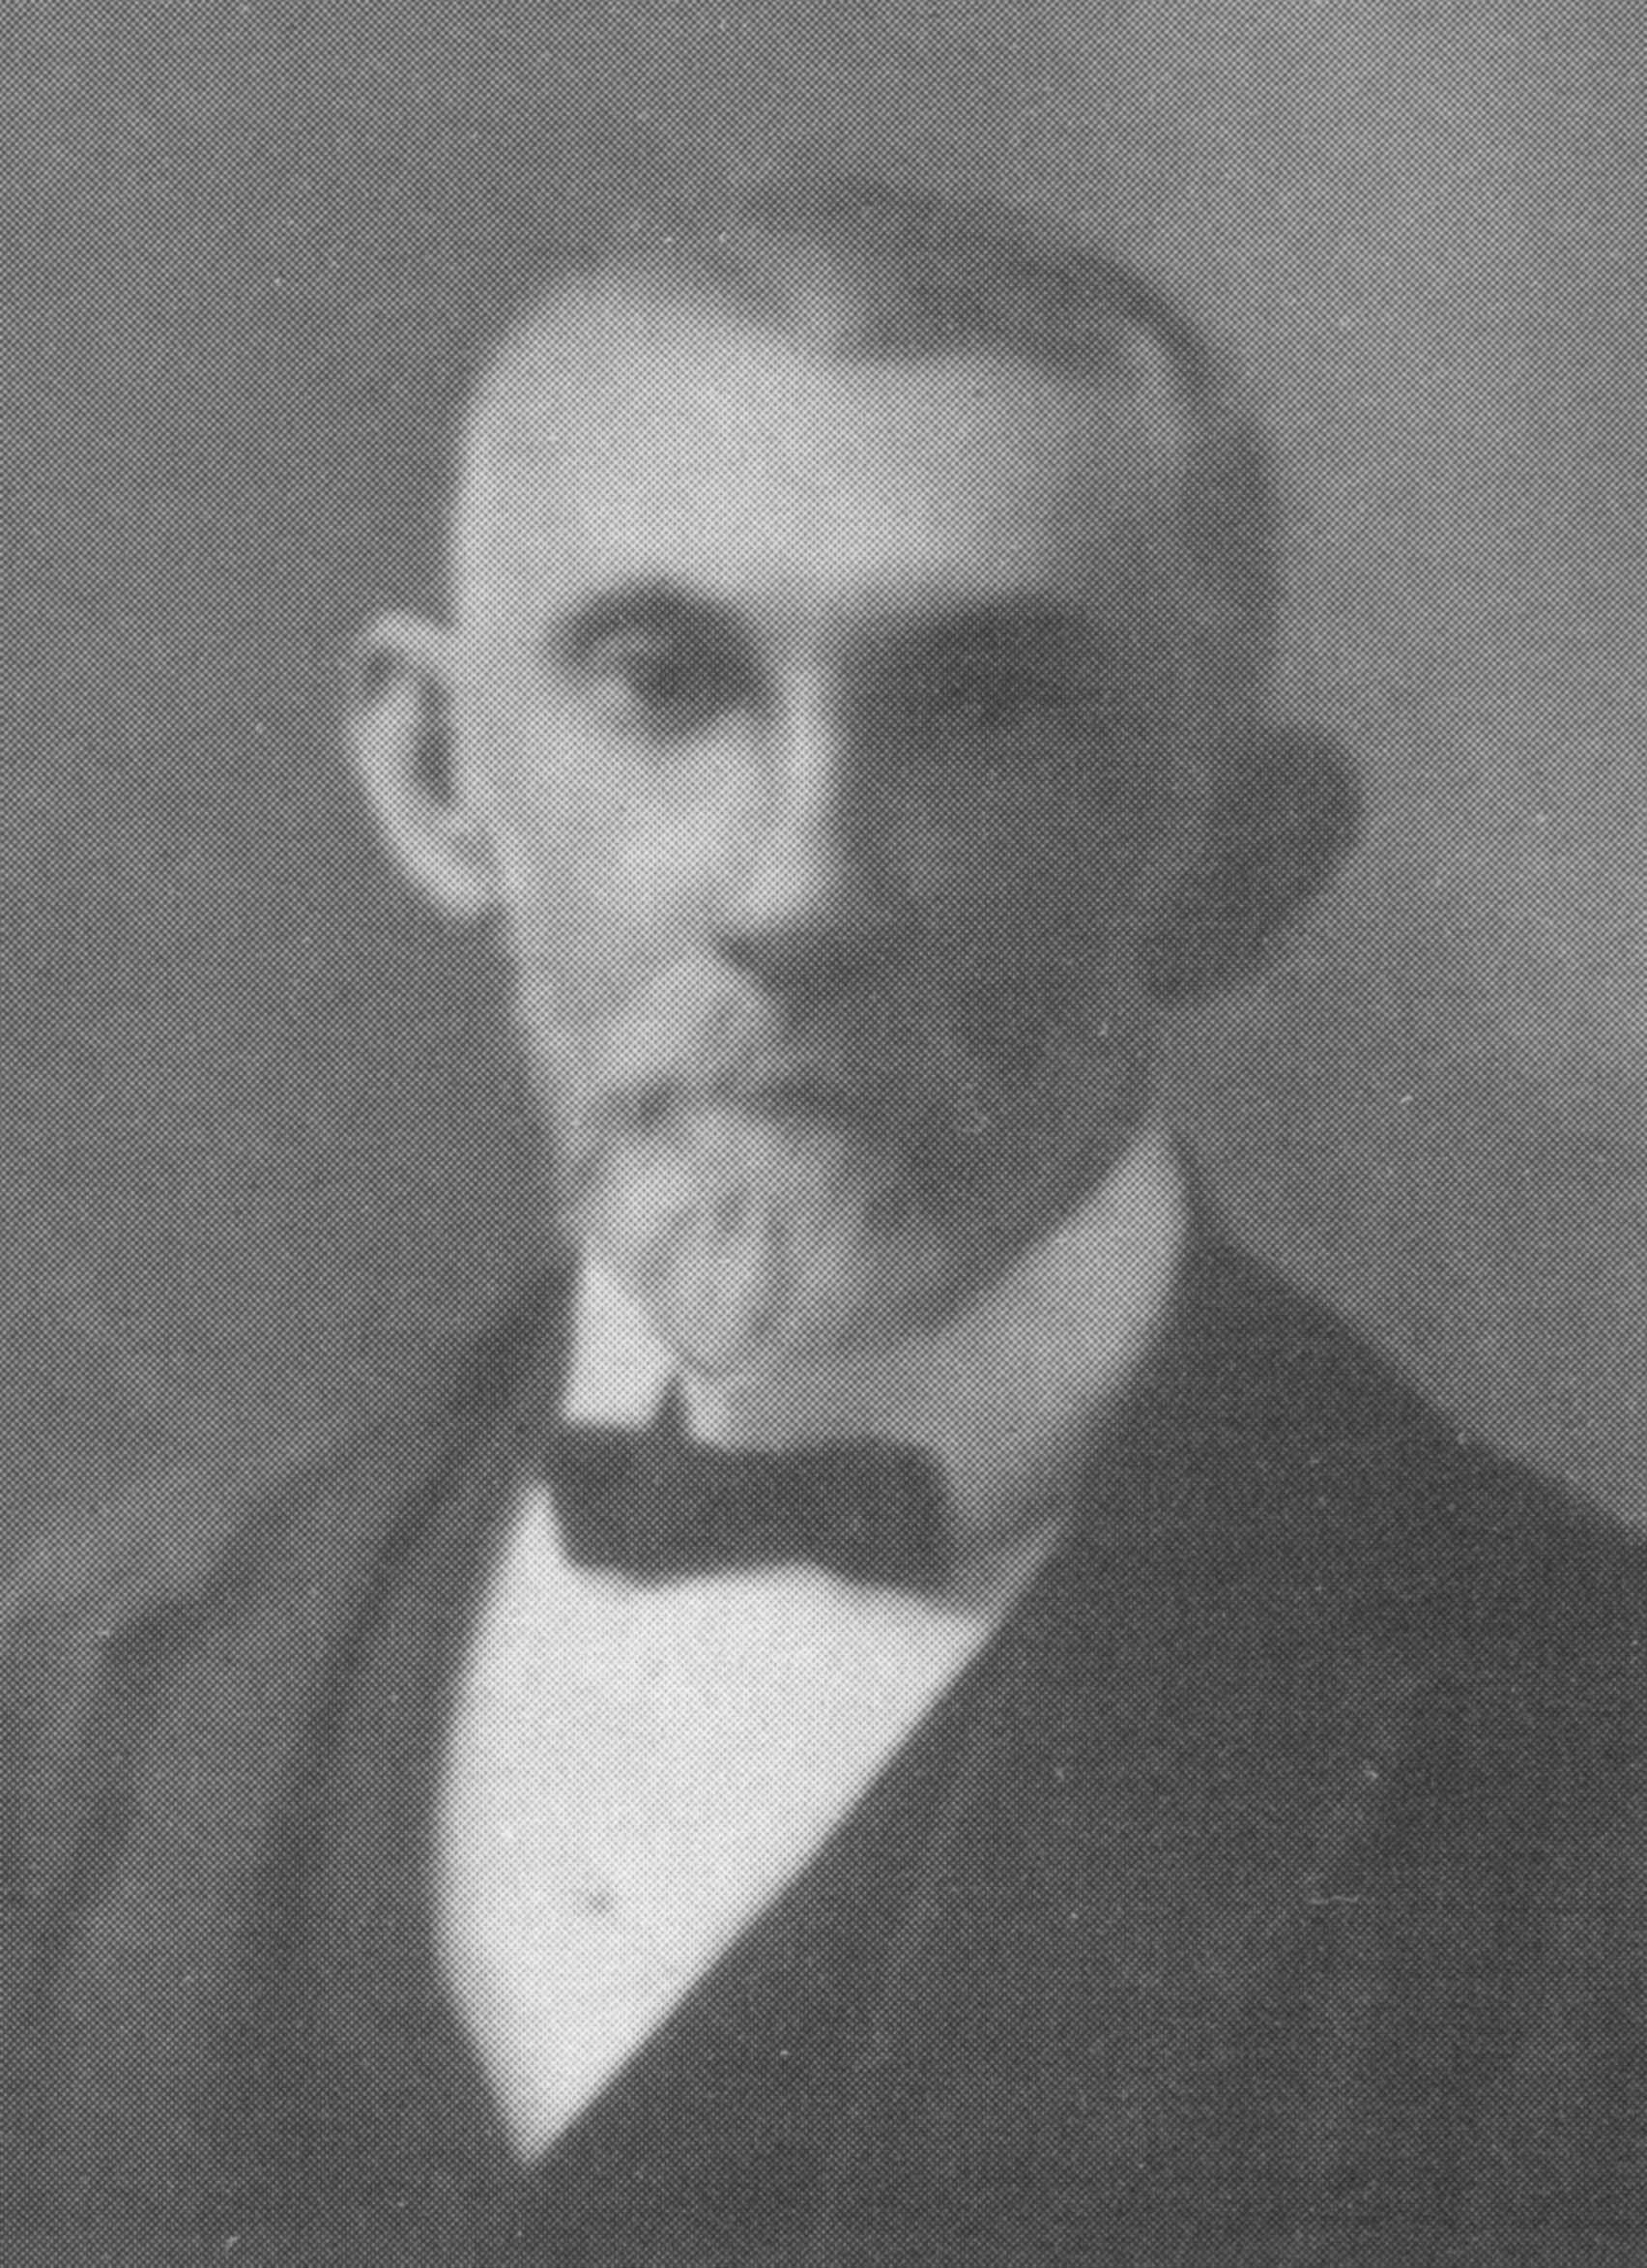 William Kertis White